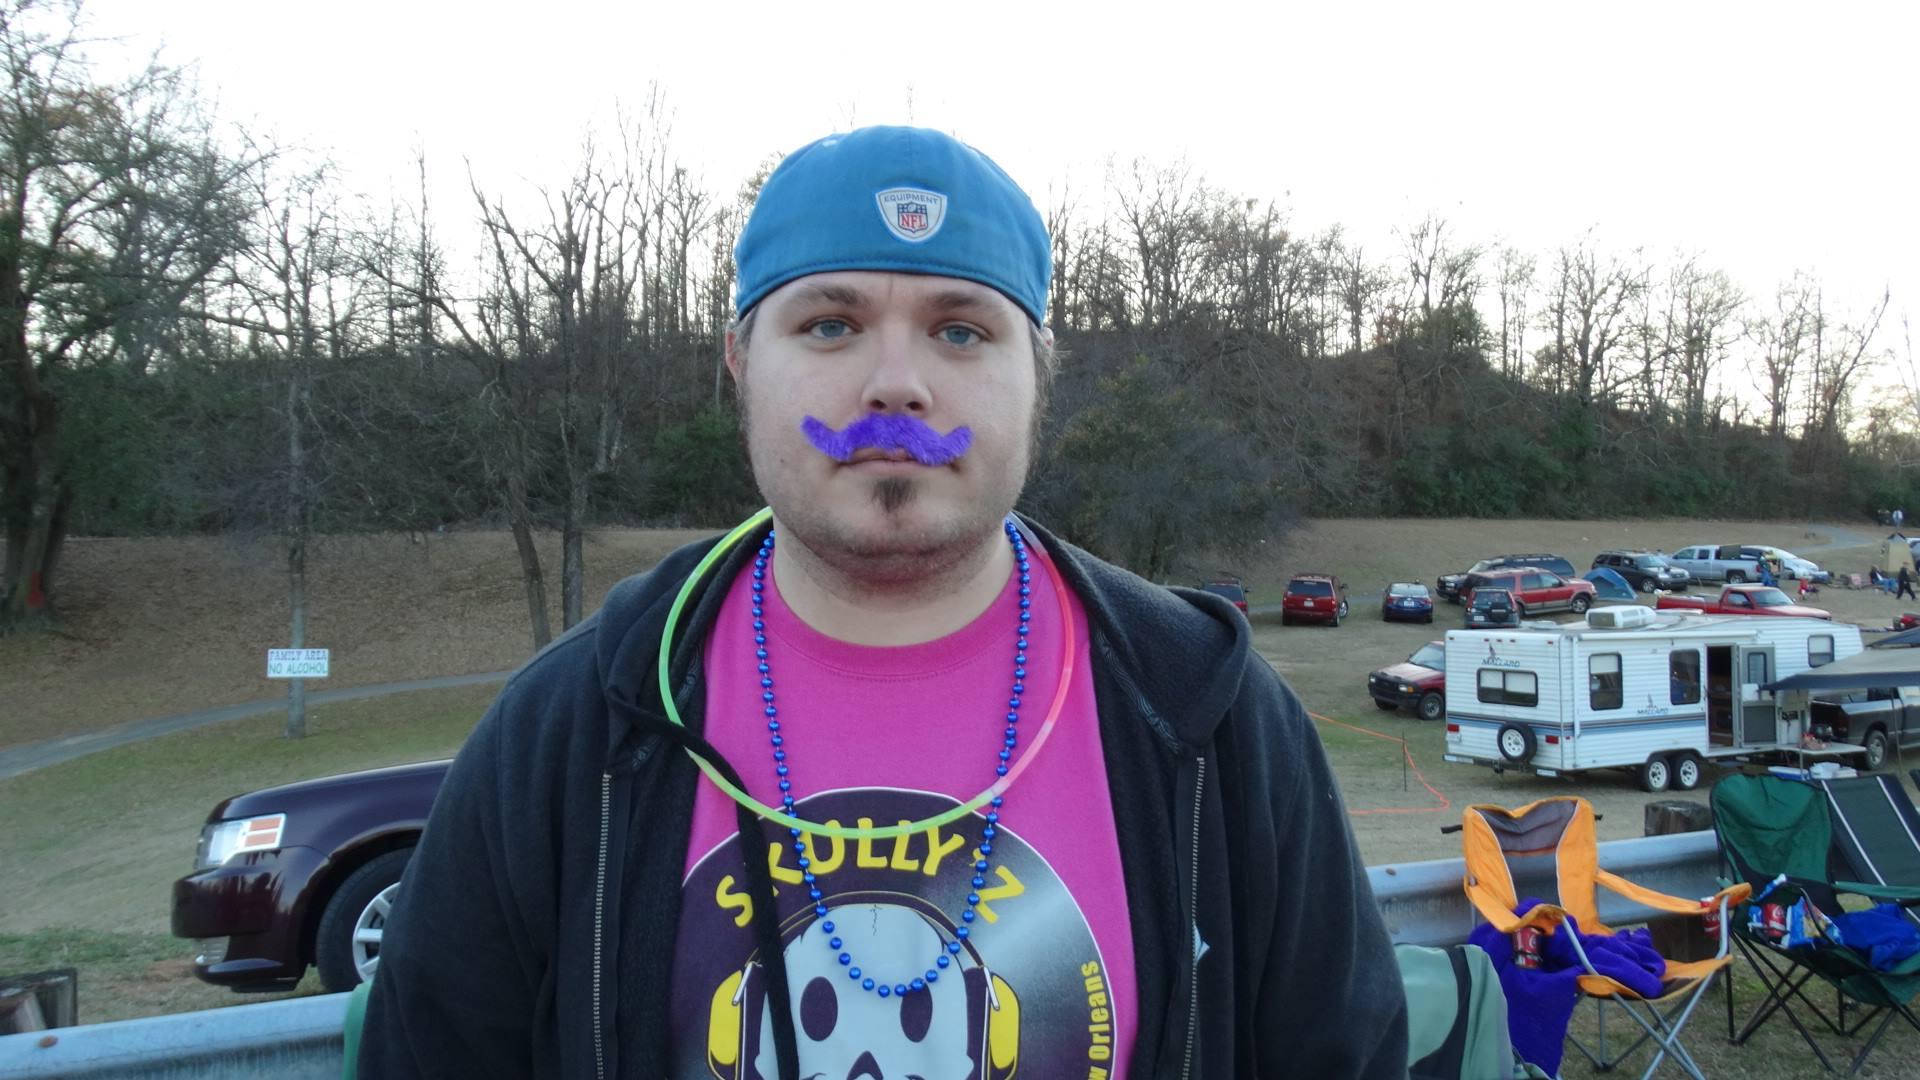 Greg At Mardi Gras